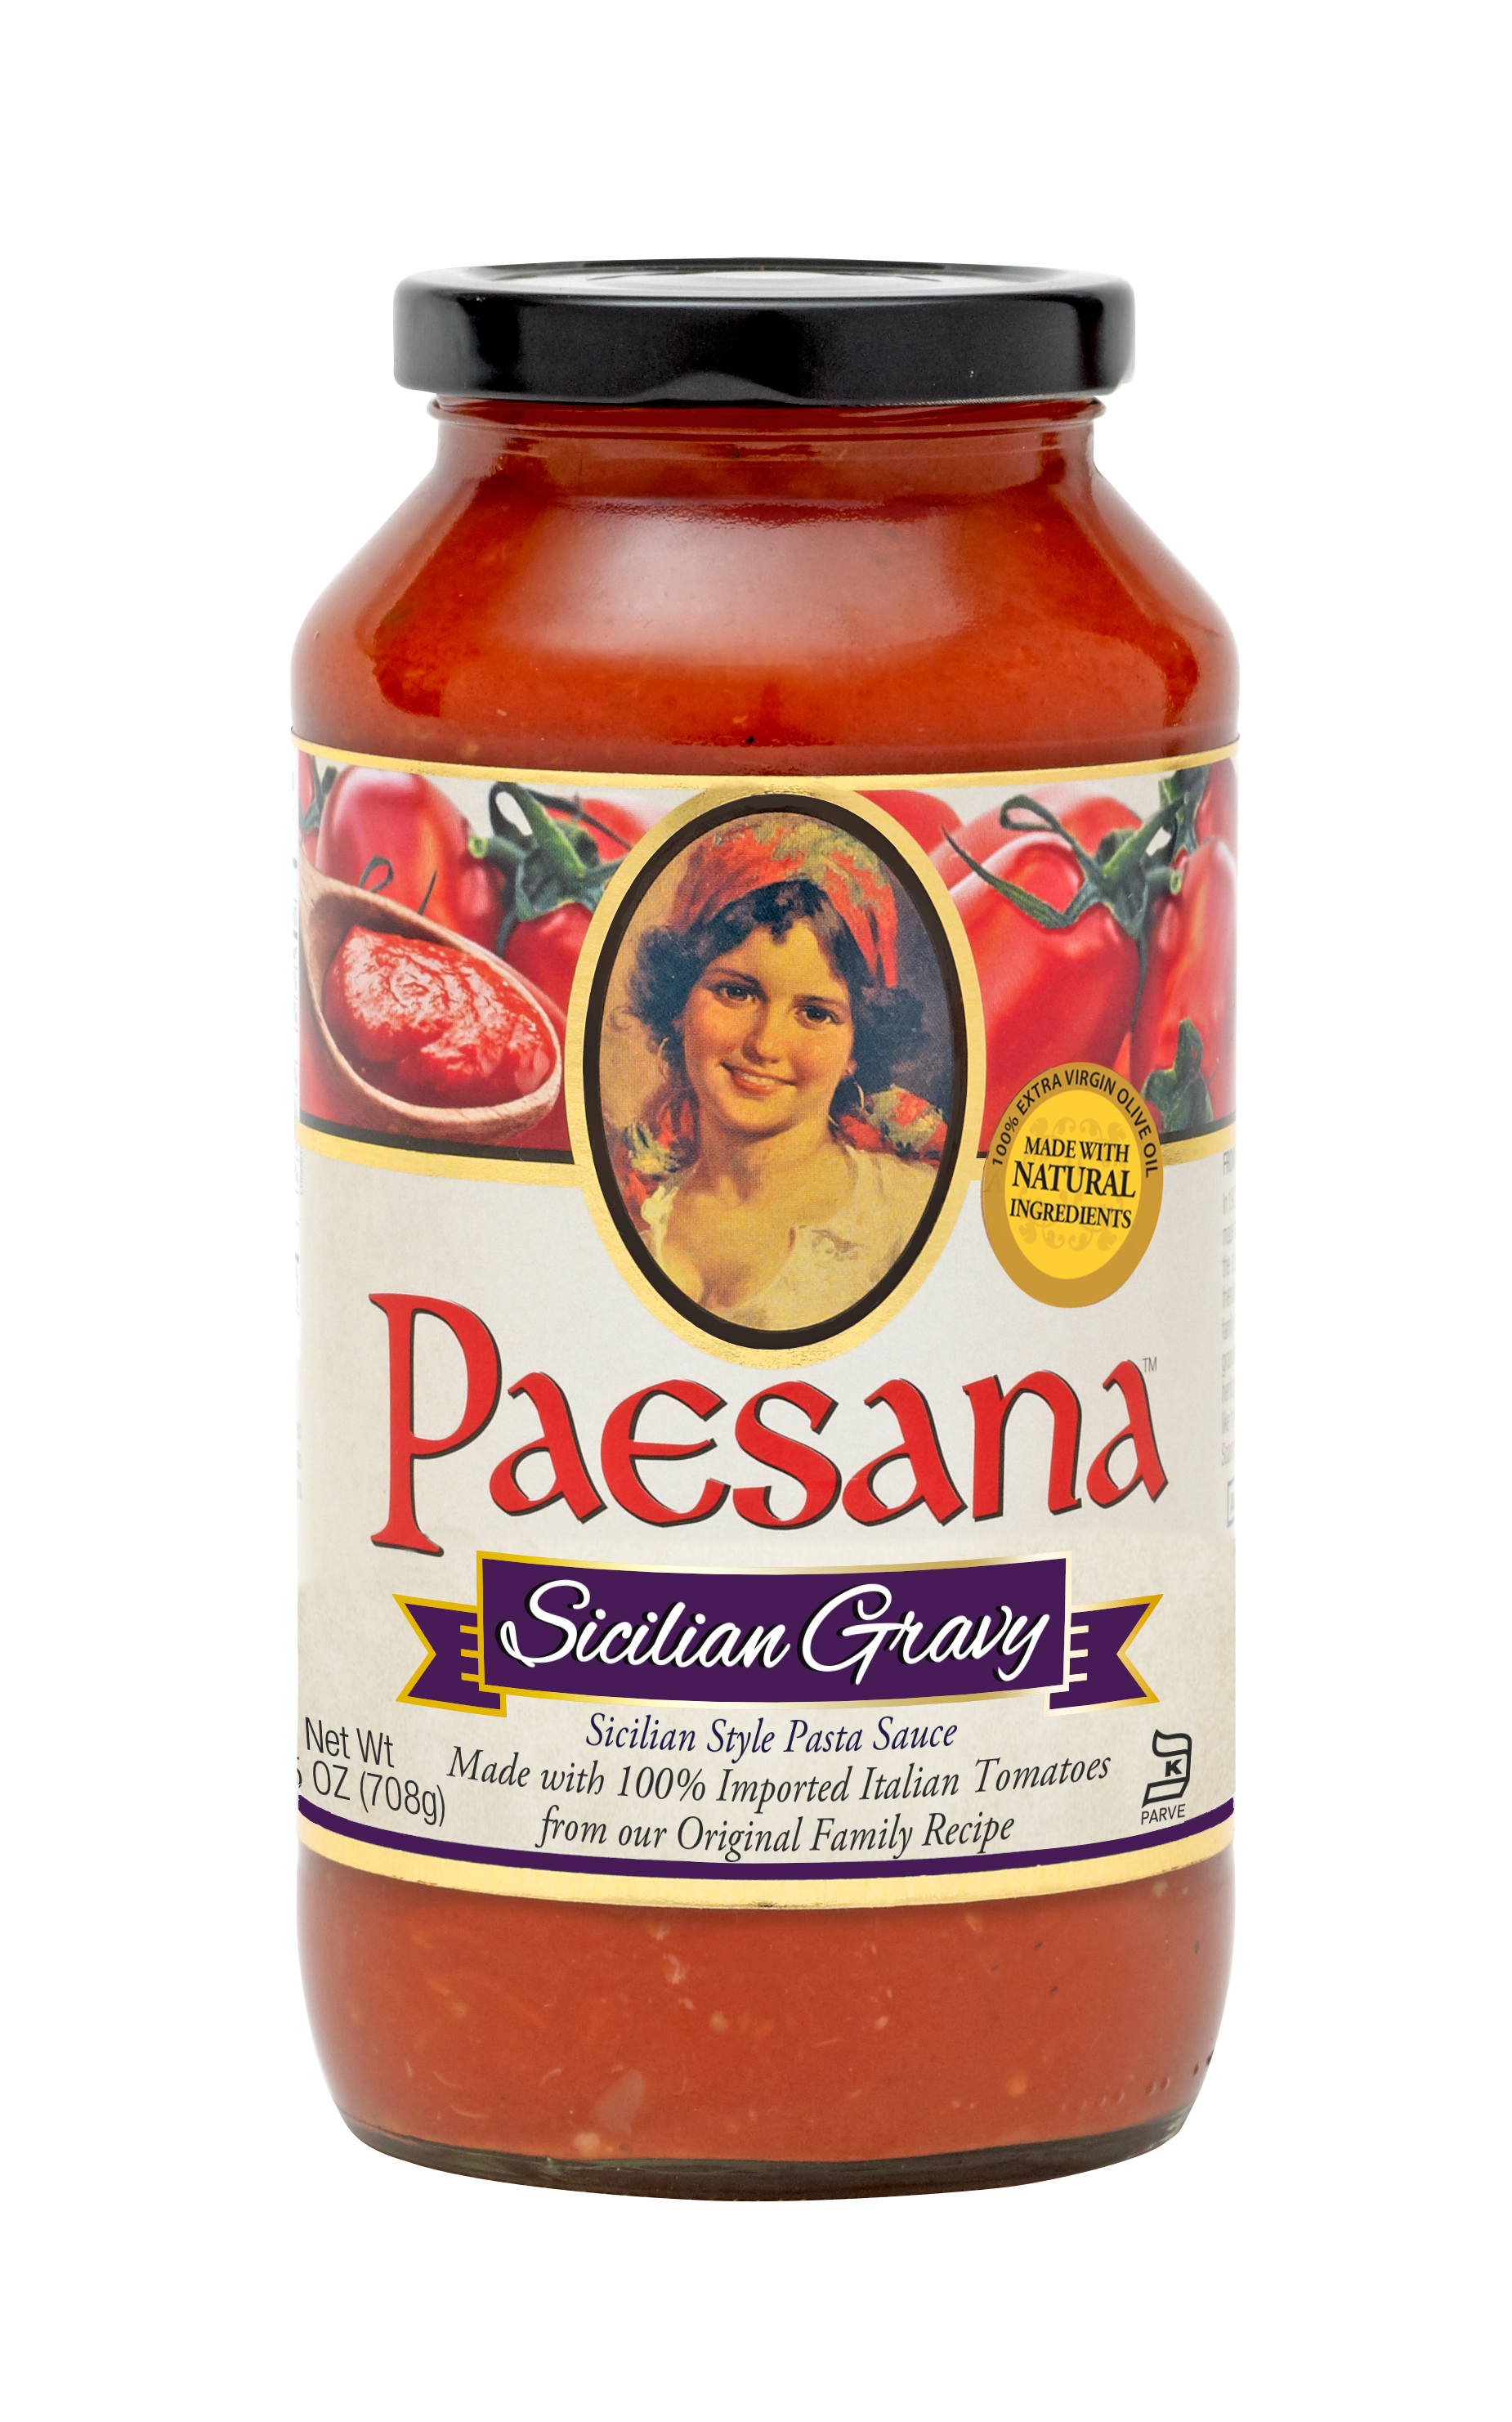 Paesana Sicilan Gravy Sauce